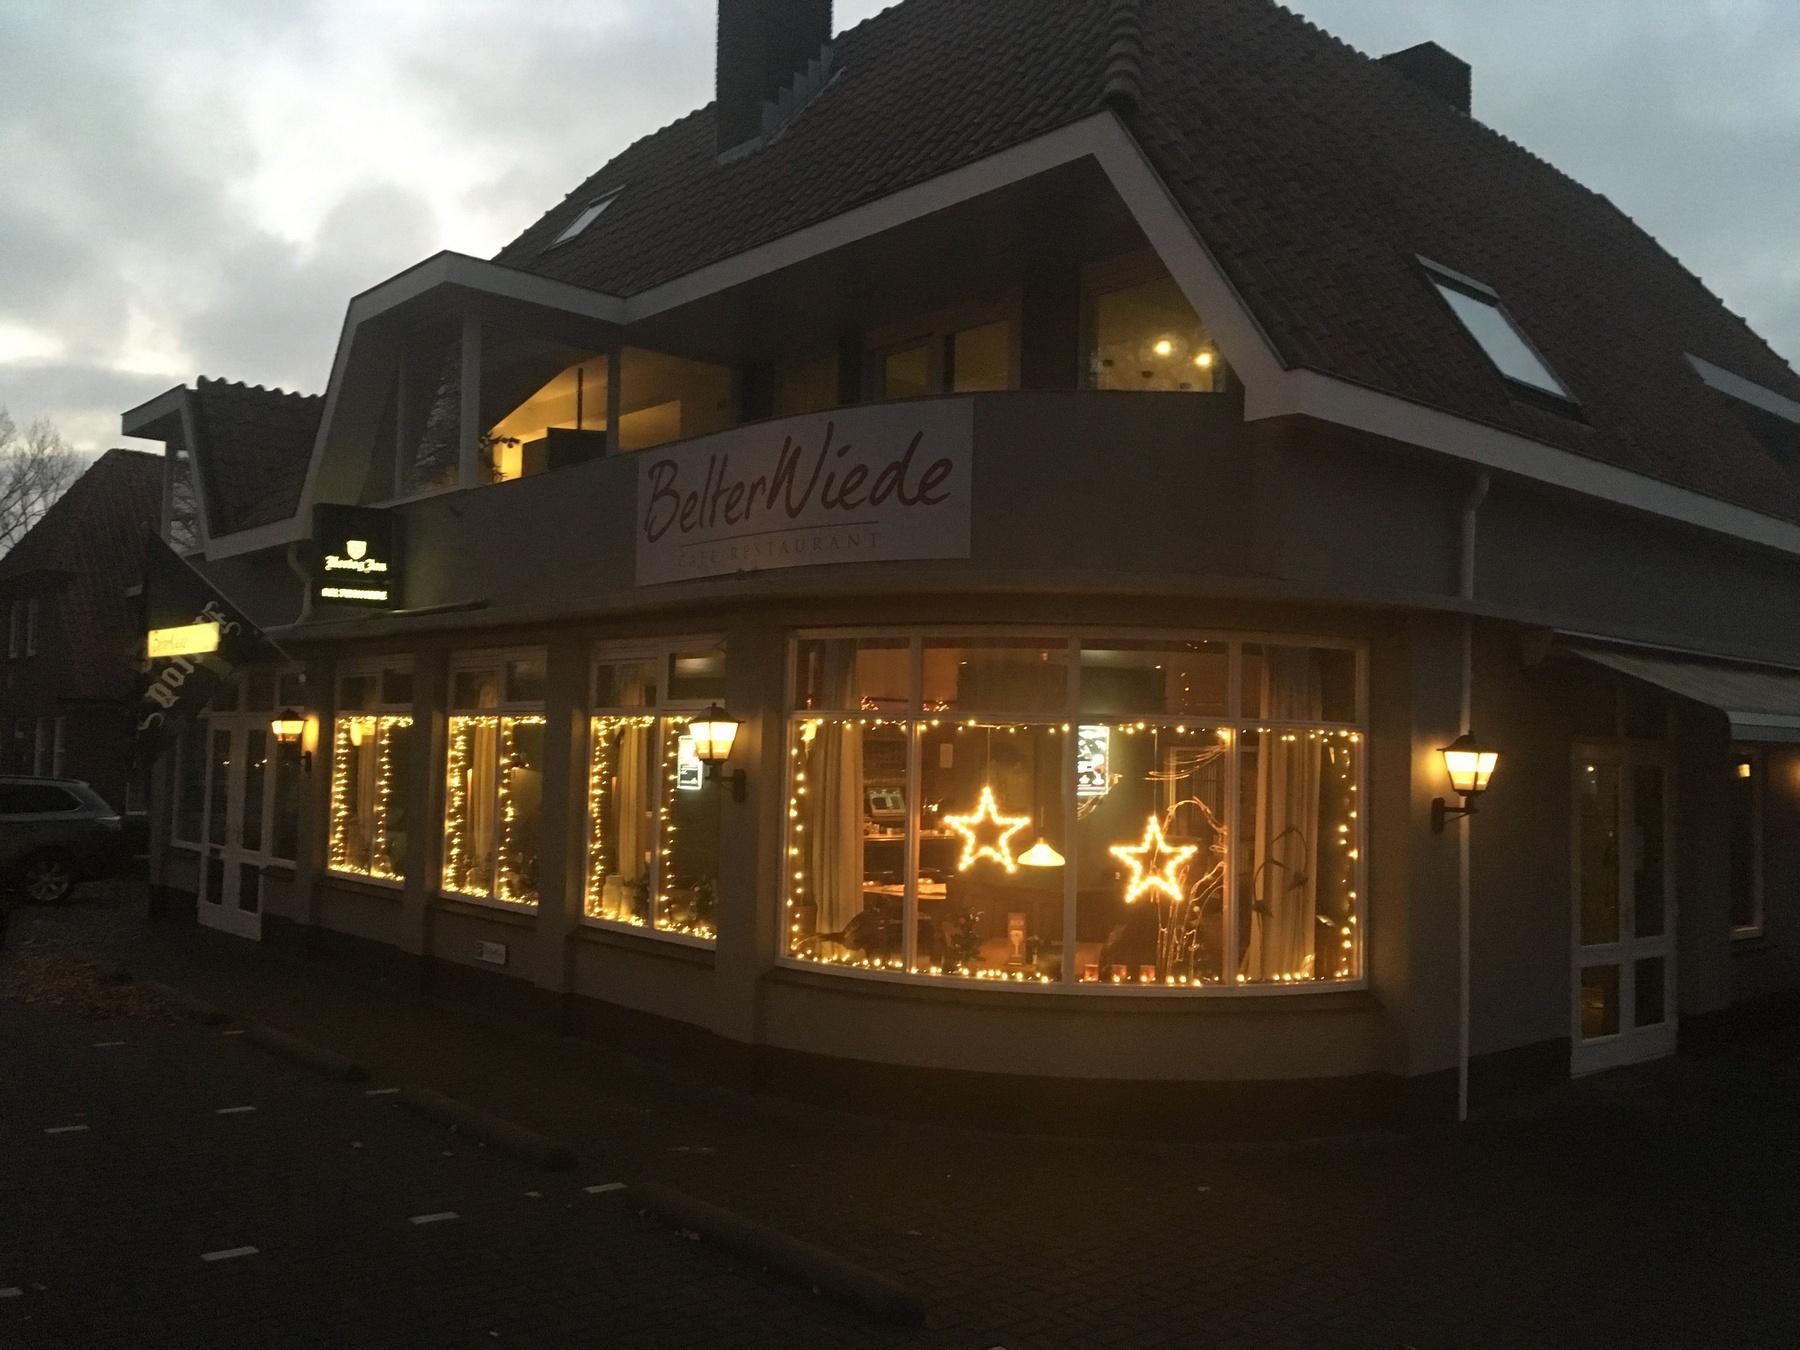 Restaurant Belterwiede Wanneperveen Kerst